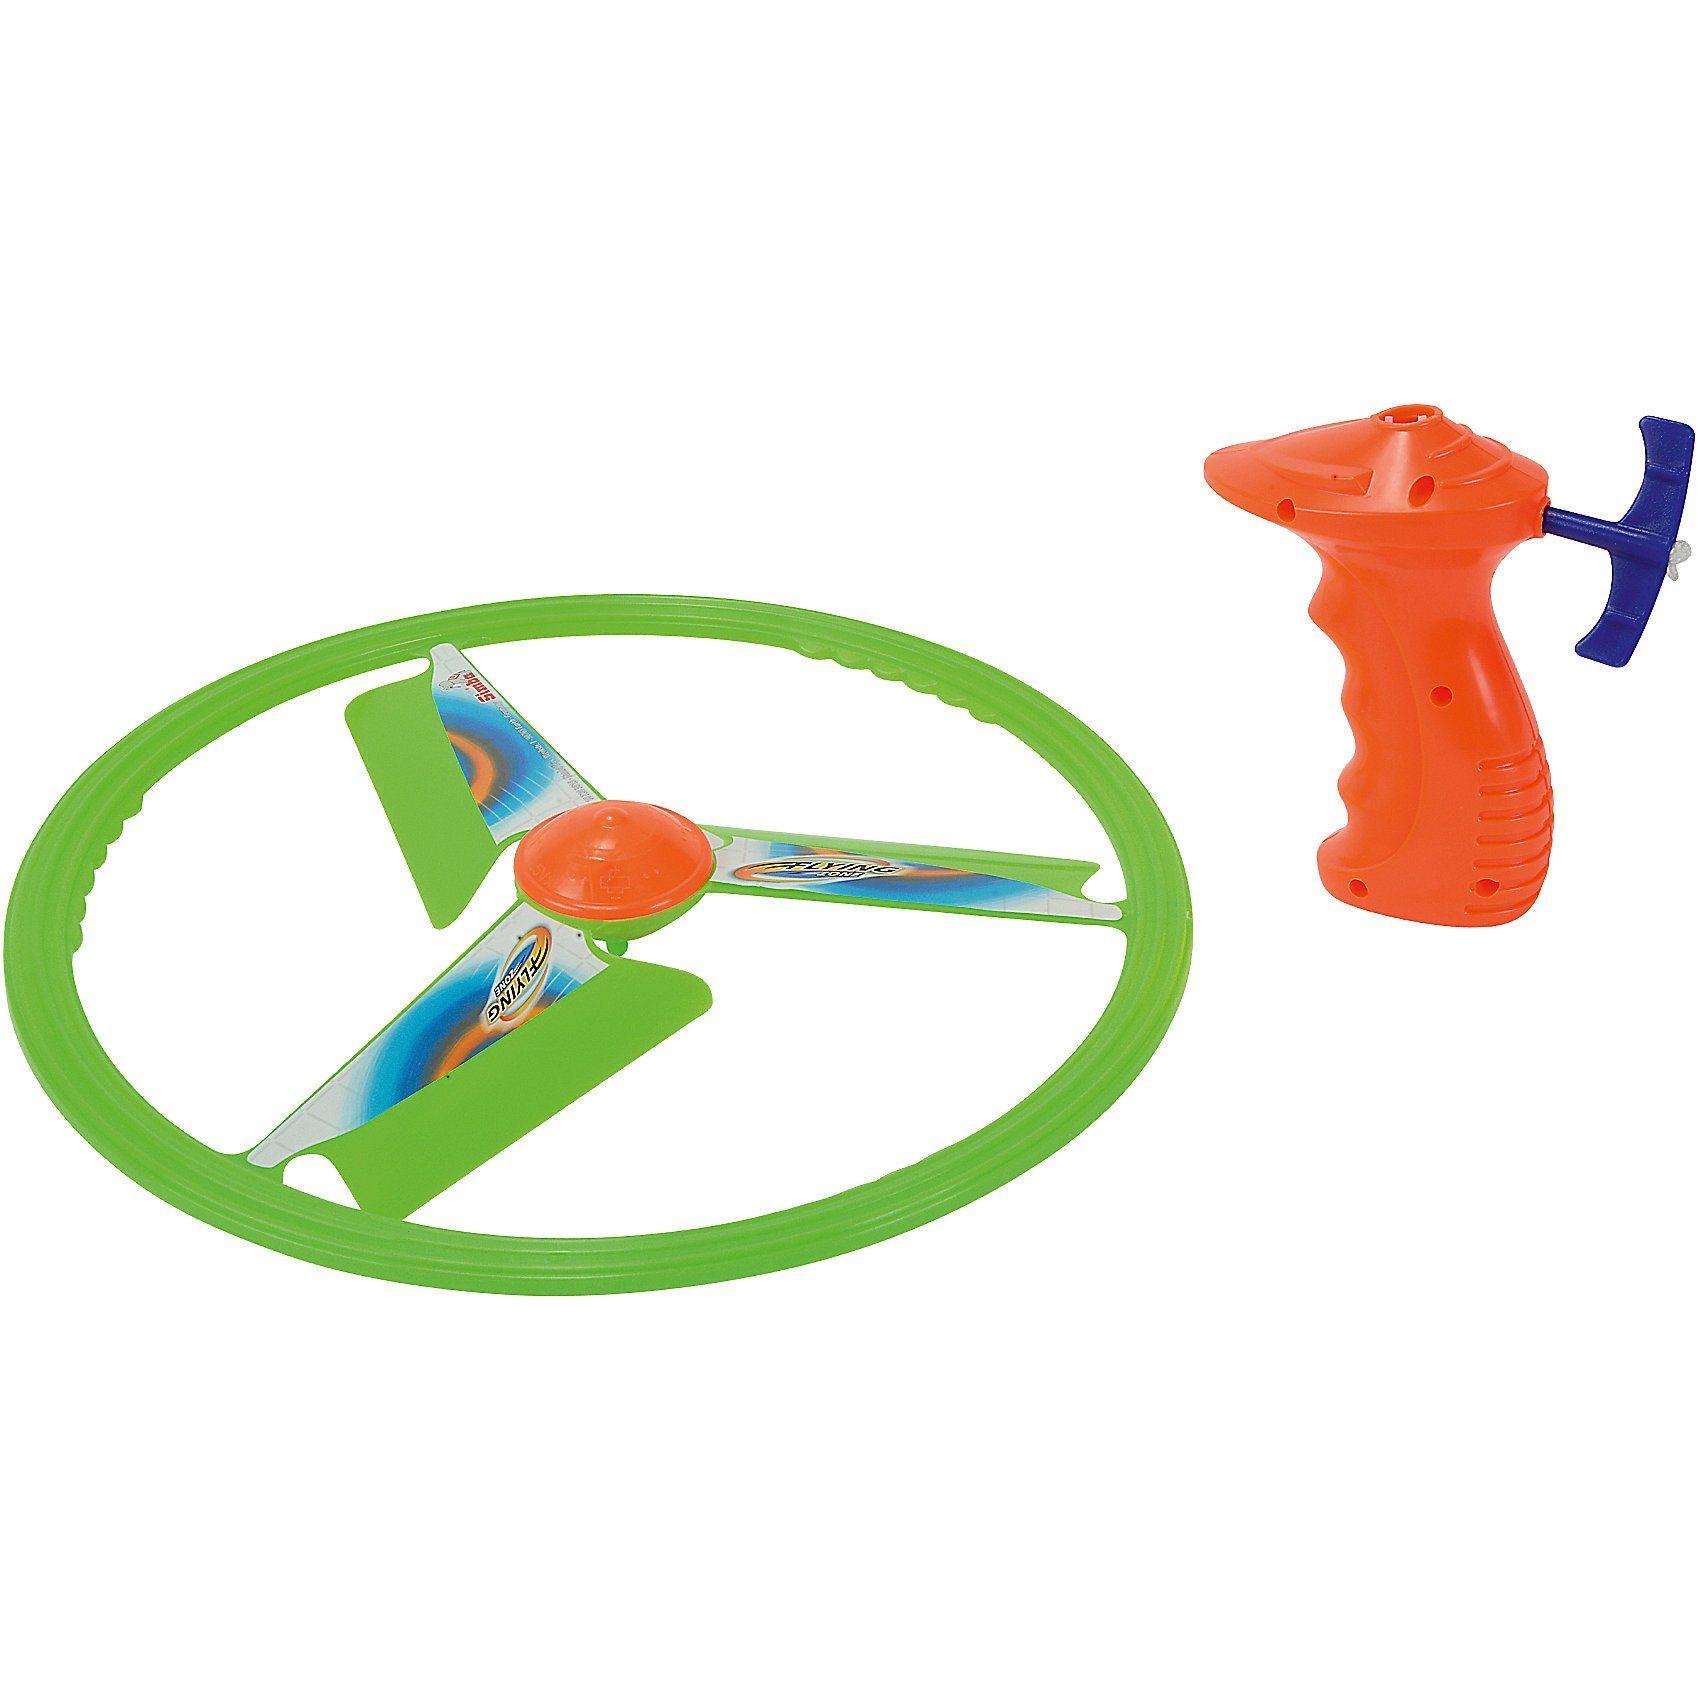 Simba Rotor Flyer Flugspiel, sortiert